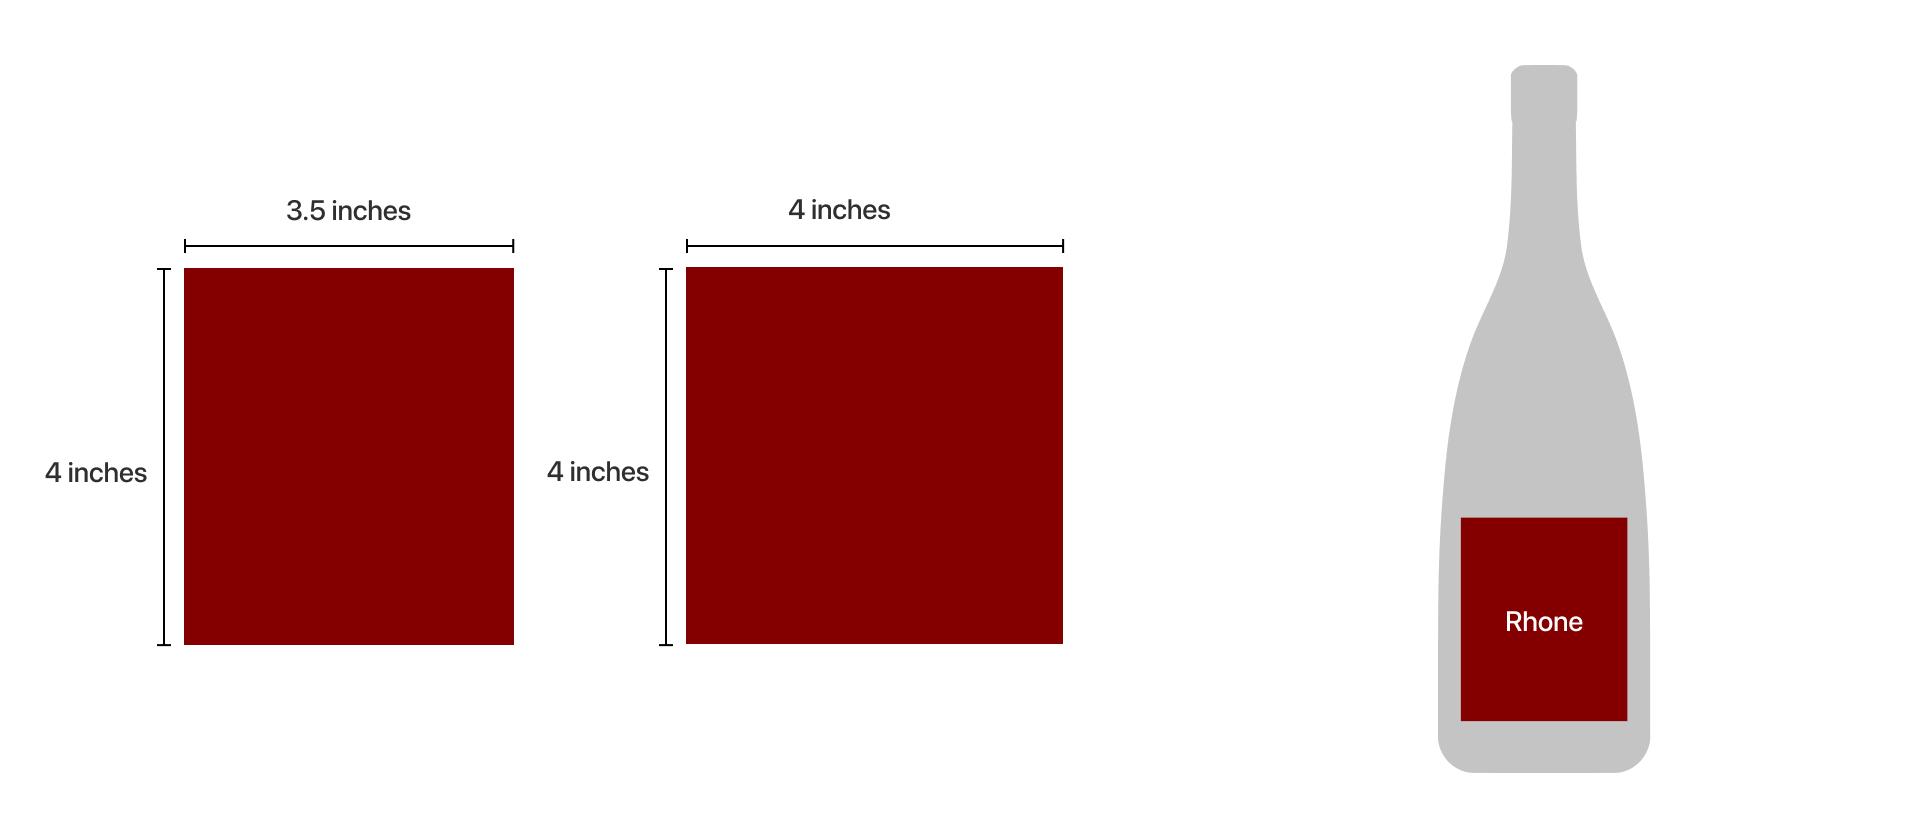 Rhone bottle label dimension size